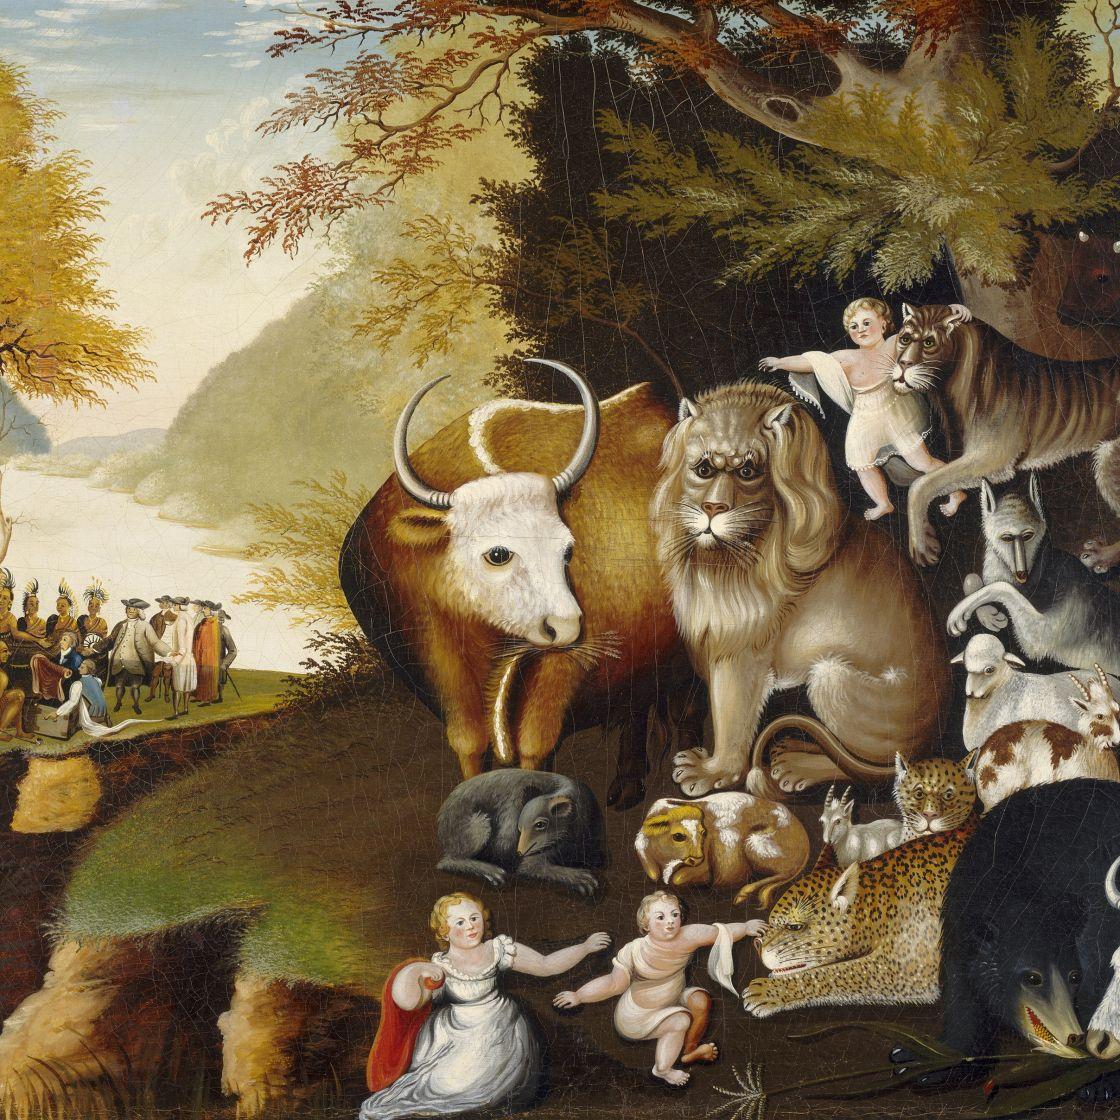 Edward Hicks The Peaceable Kingdom 1826